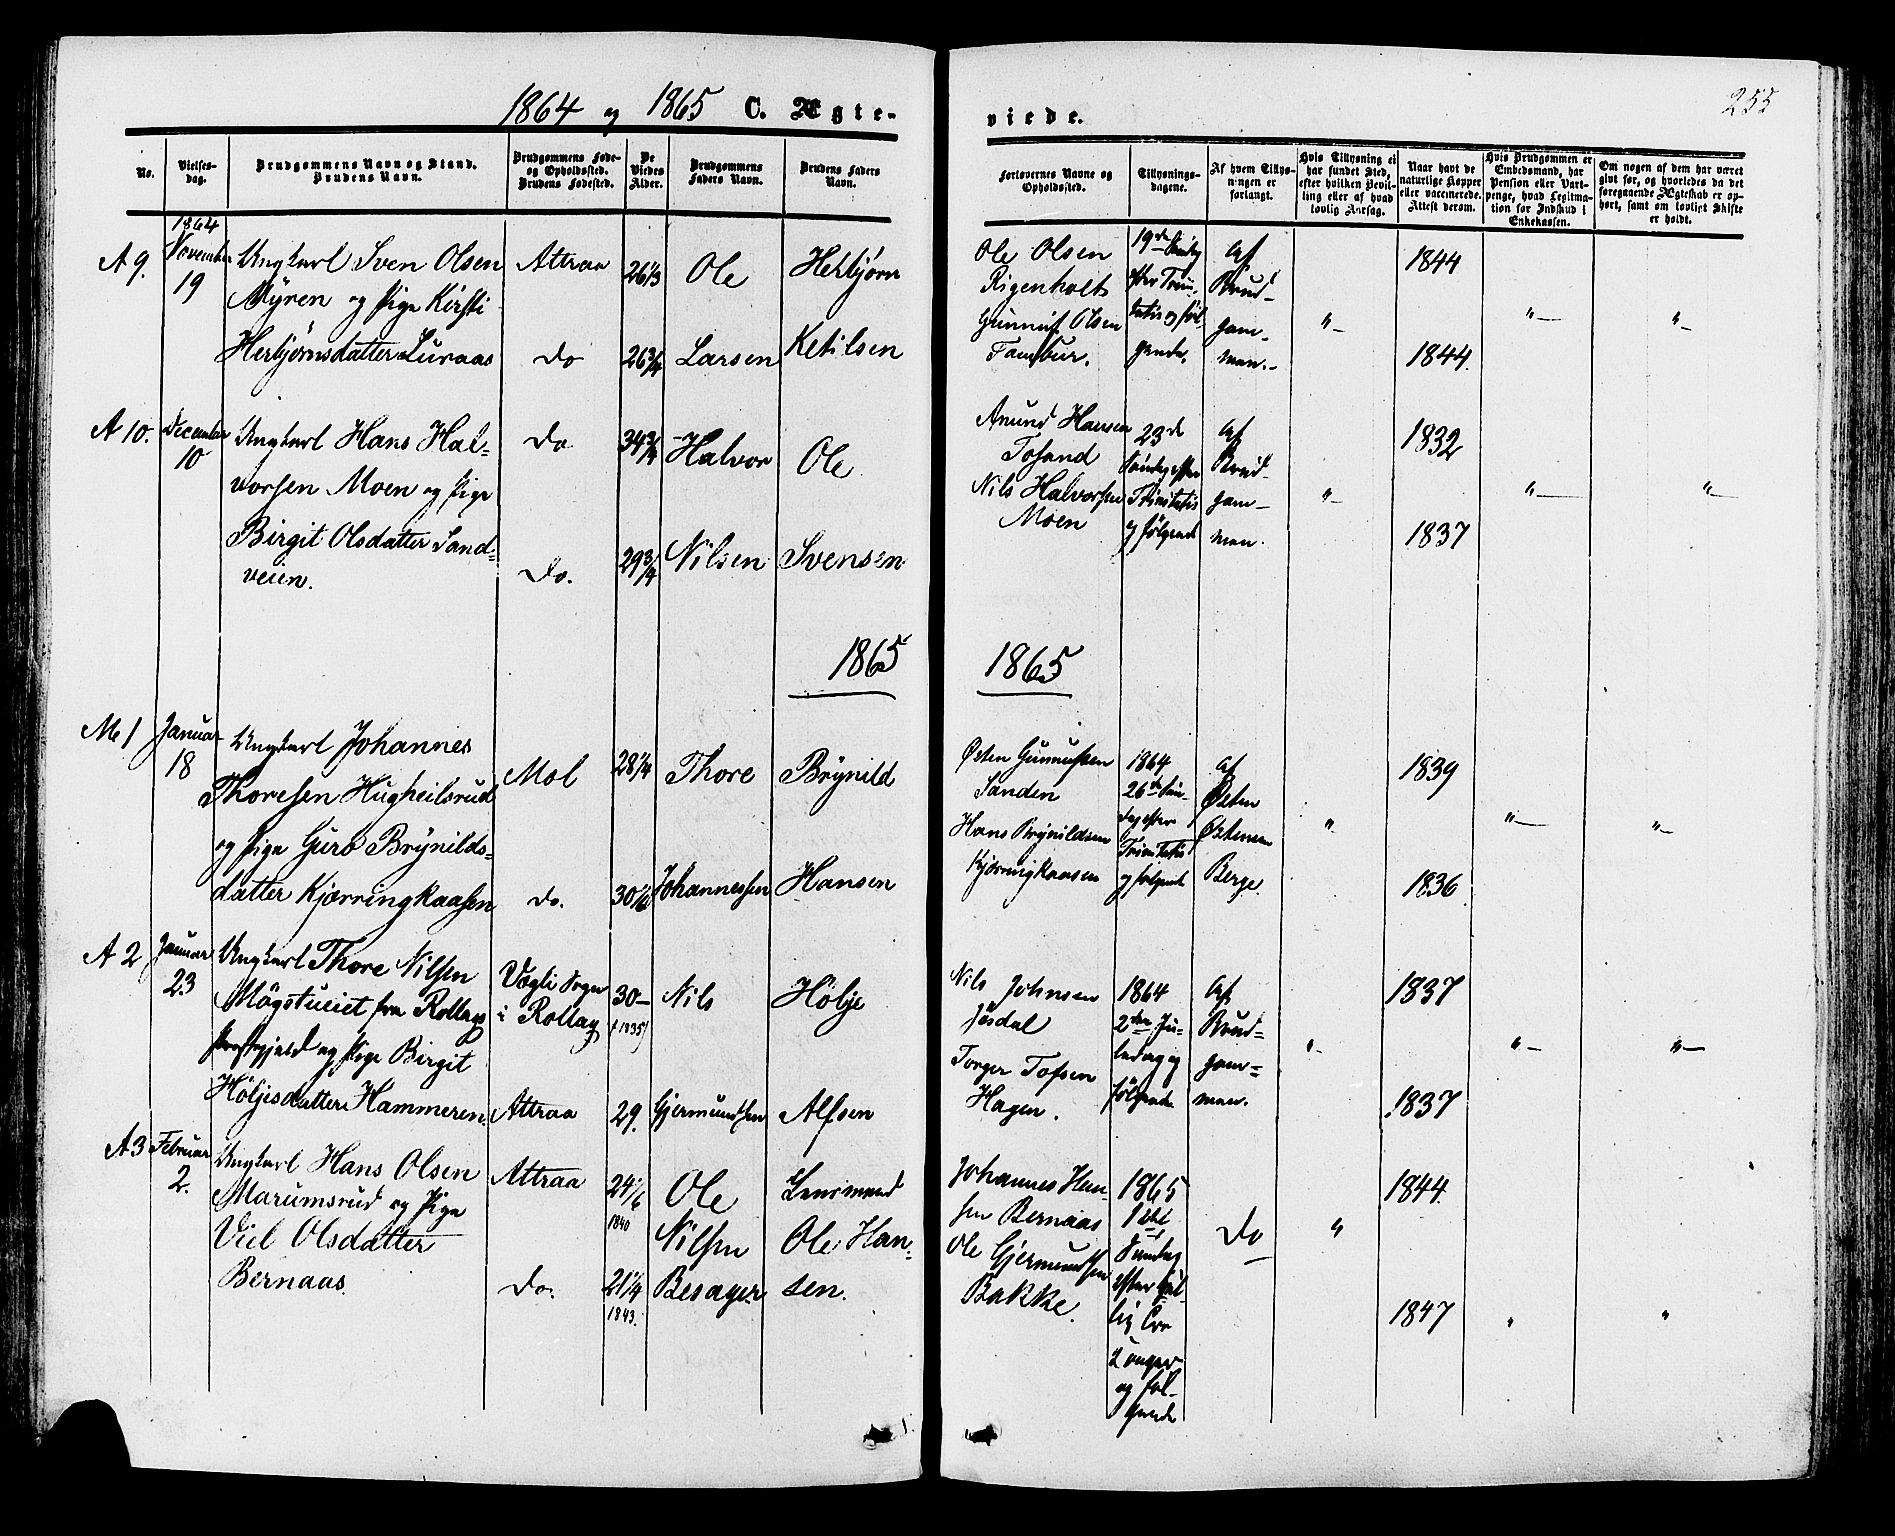 SAKO, Tinn kirkebøker, F/Fa/L0006: Ministerialbok nr. I 6, 1857-1878, s. 255